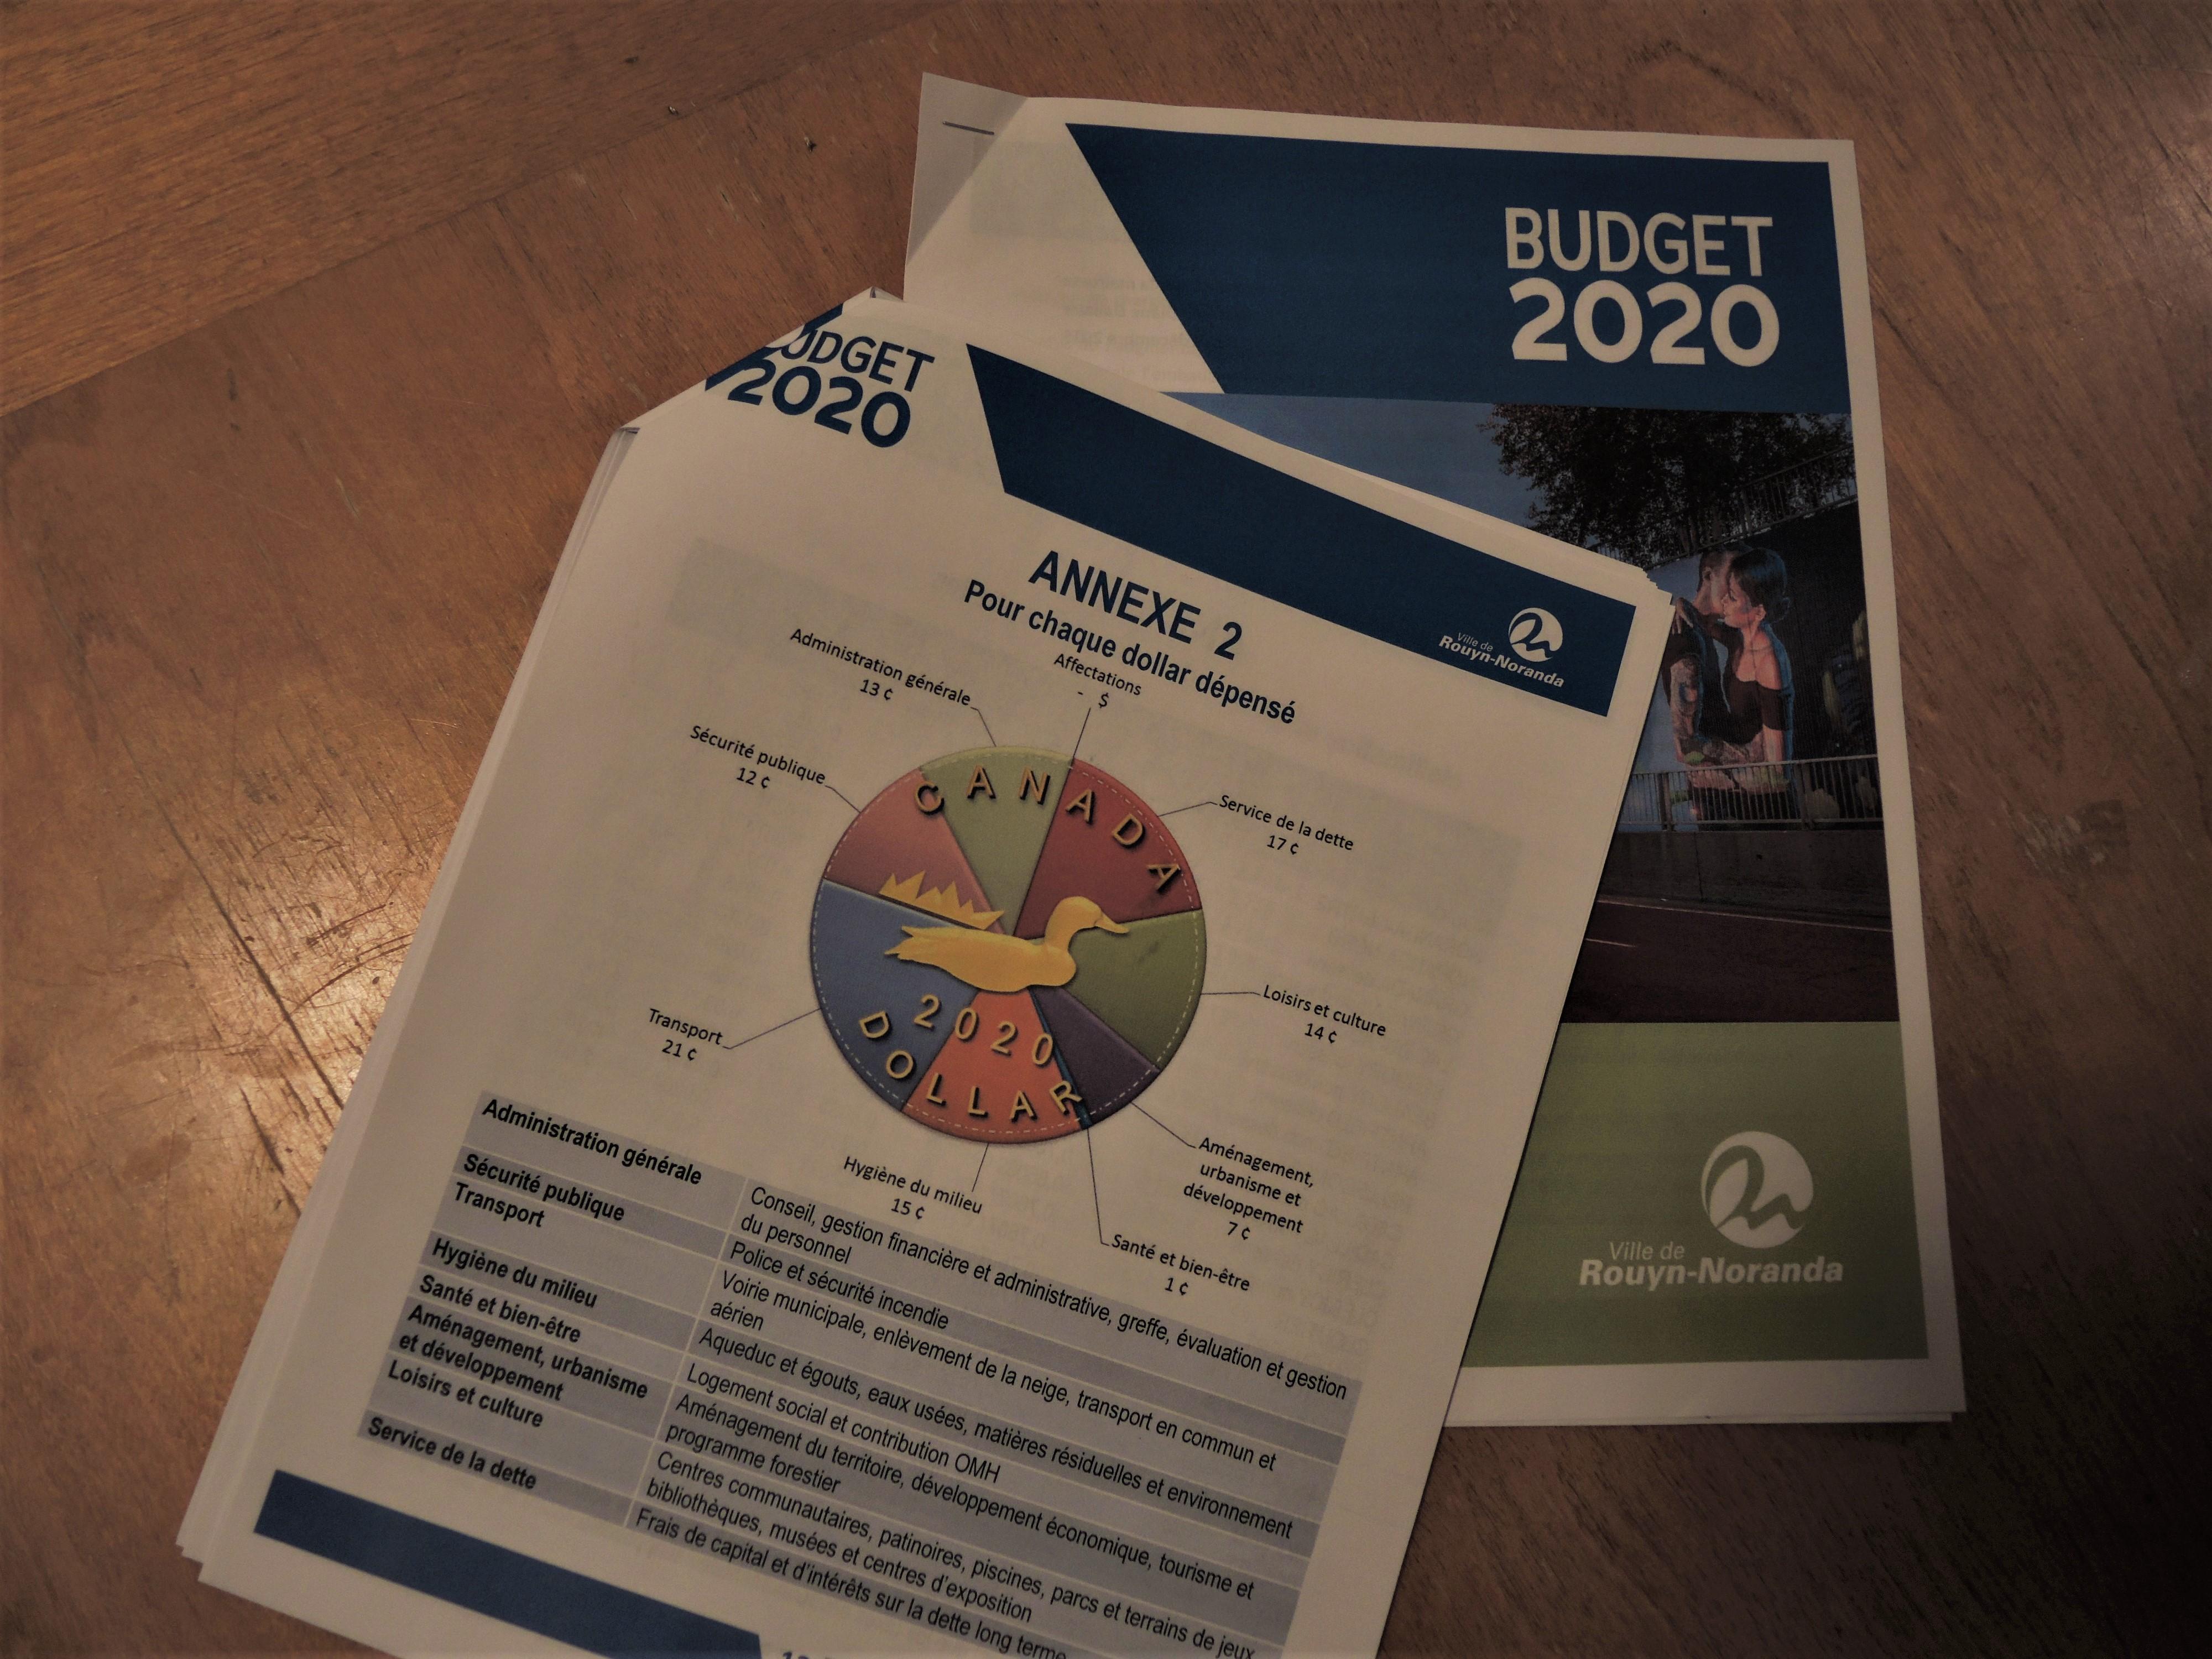 Budget Rouyn-Noranda 2020